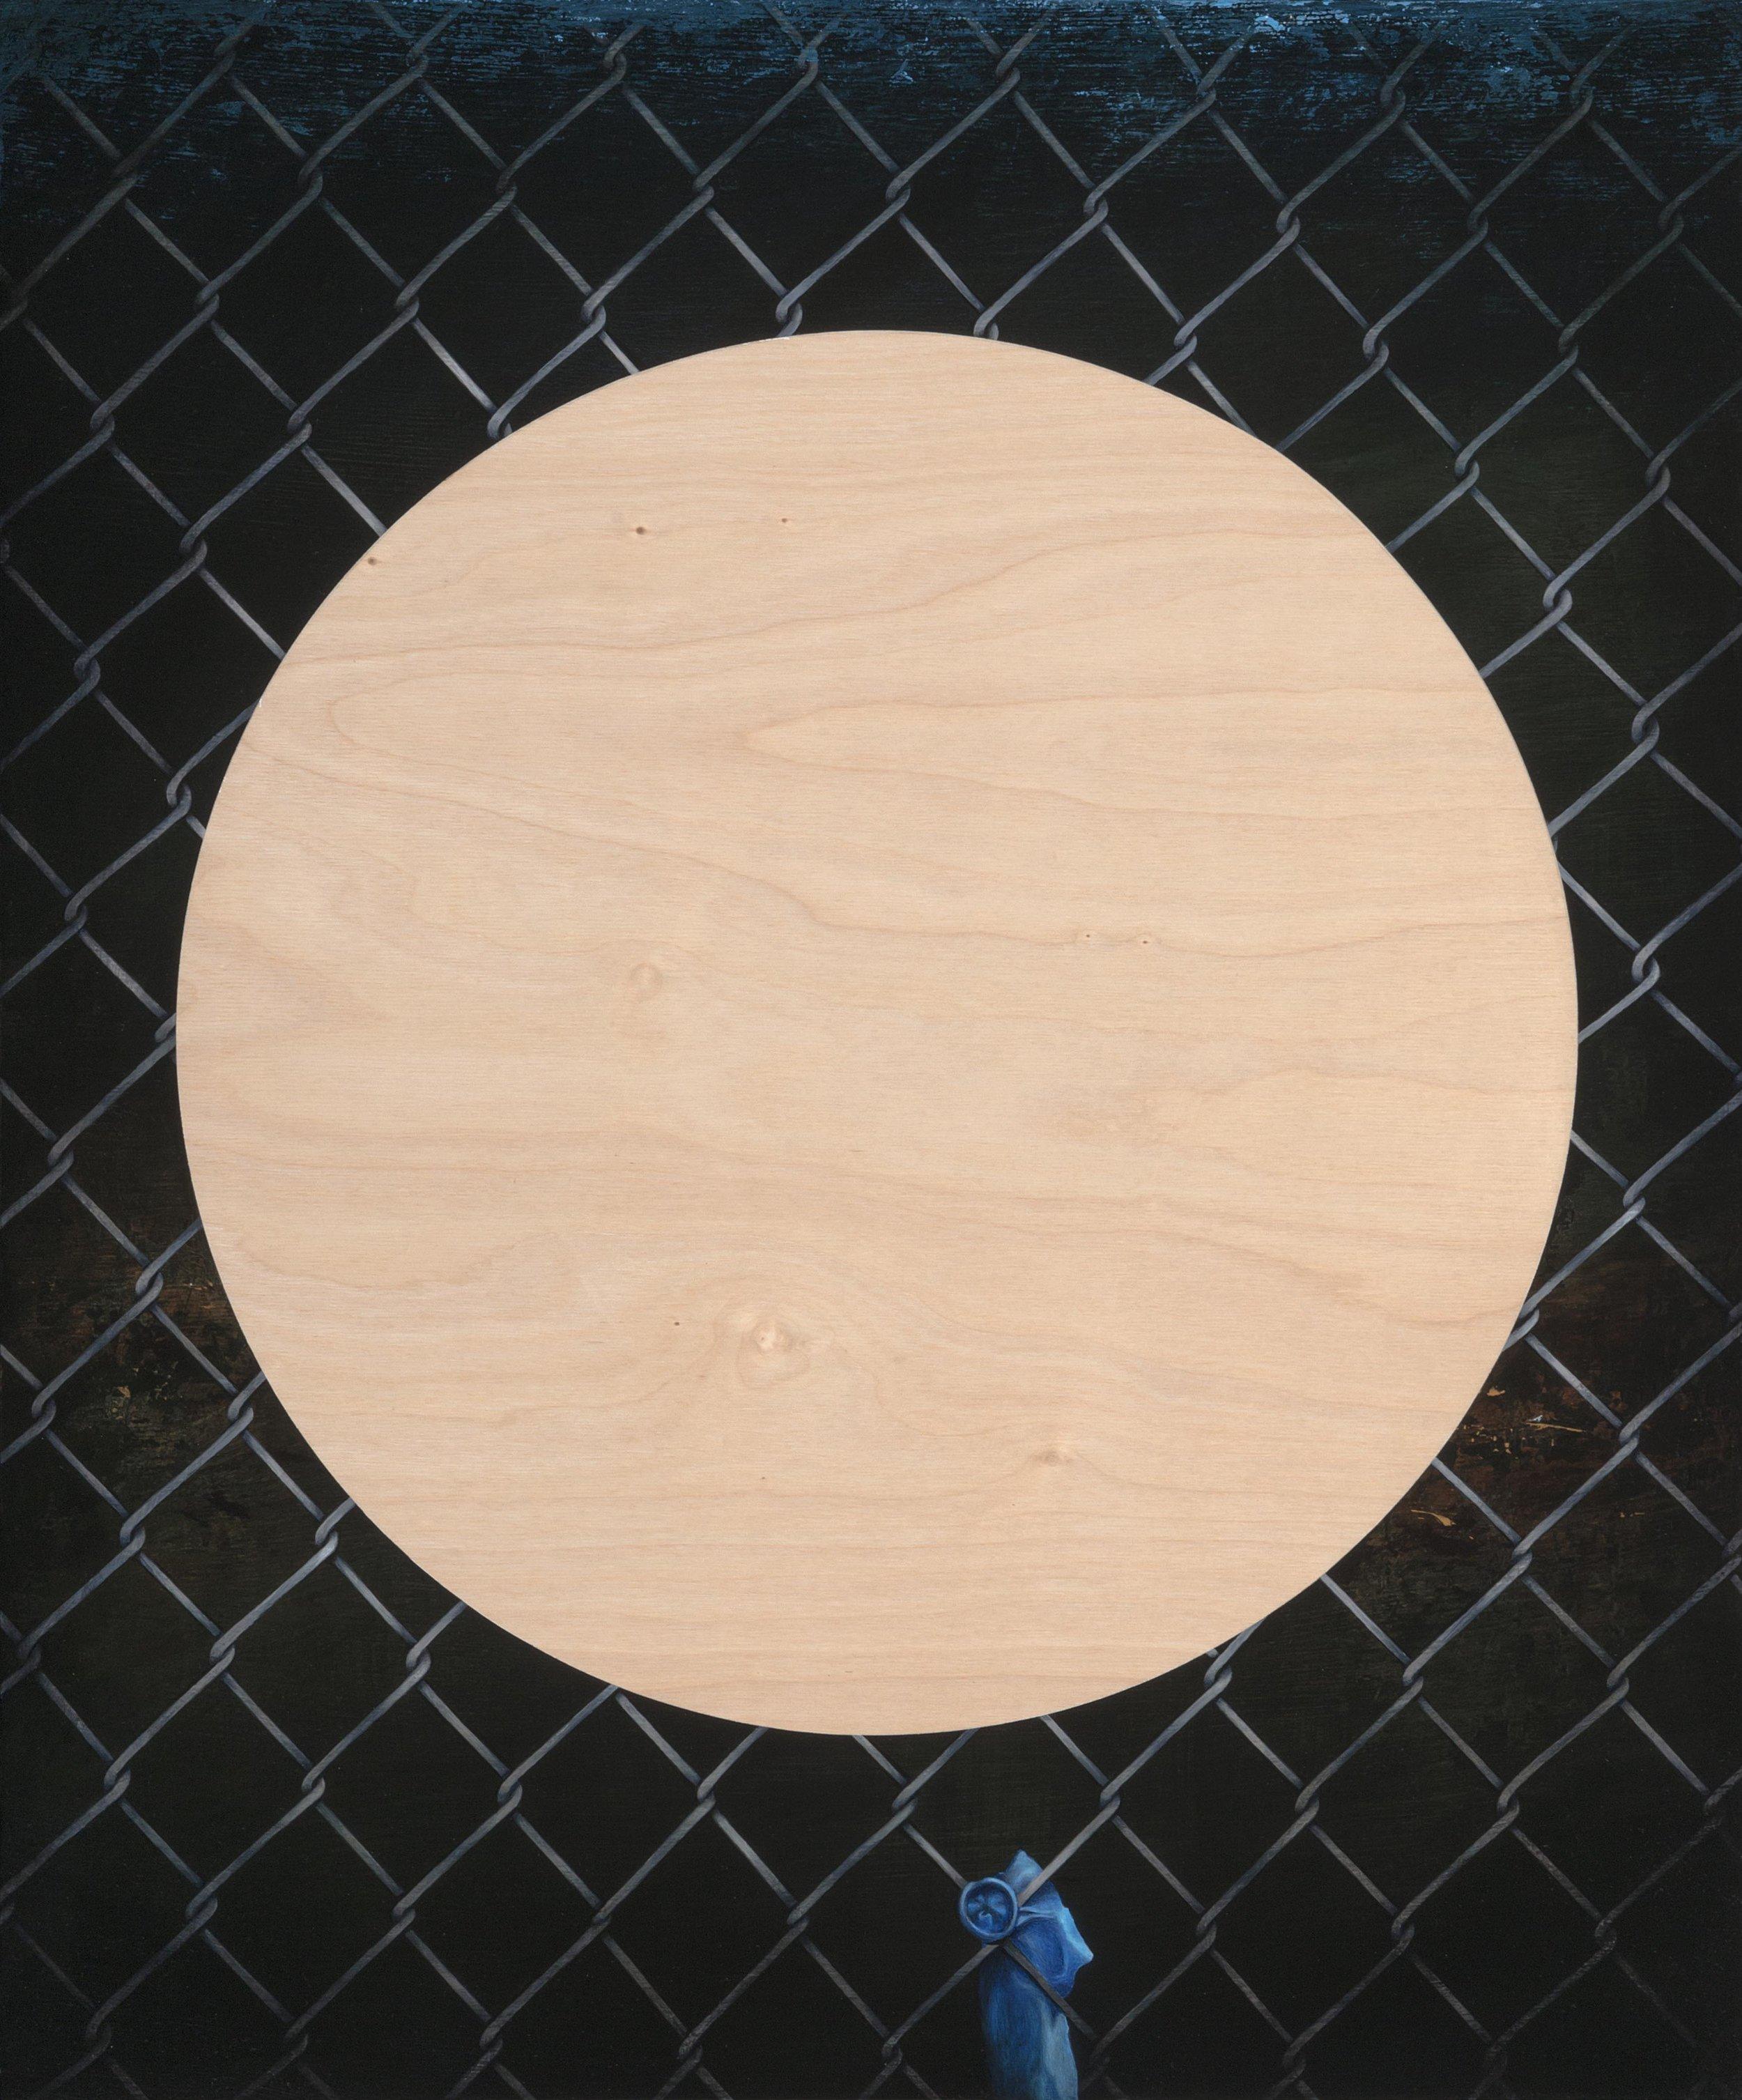 Playground, 2016,acrylic on wood, 60 x 50 cm